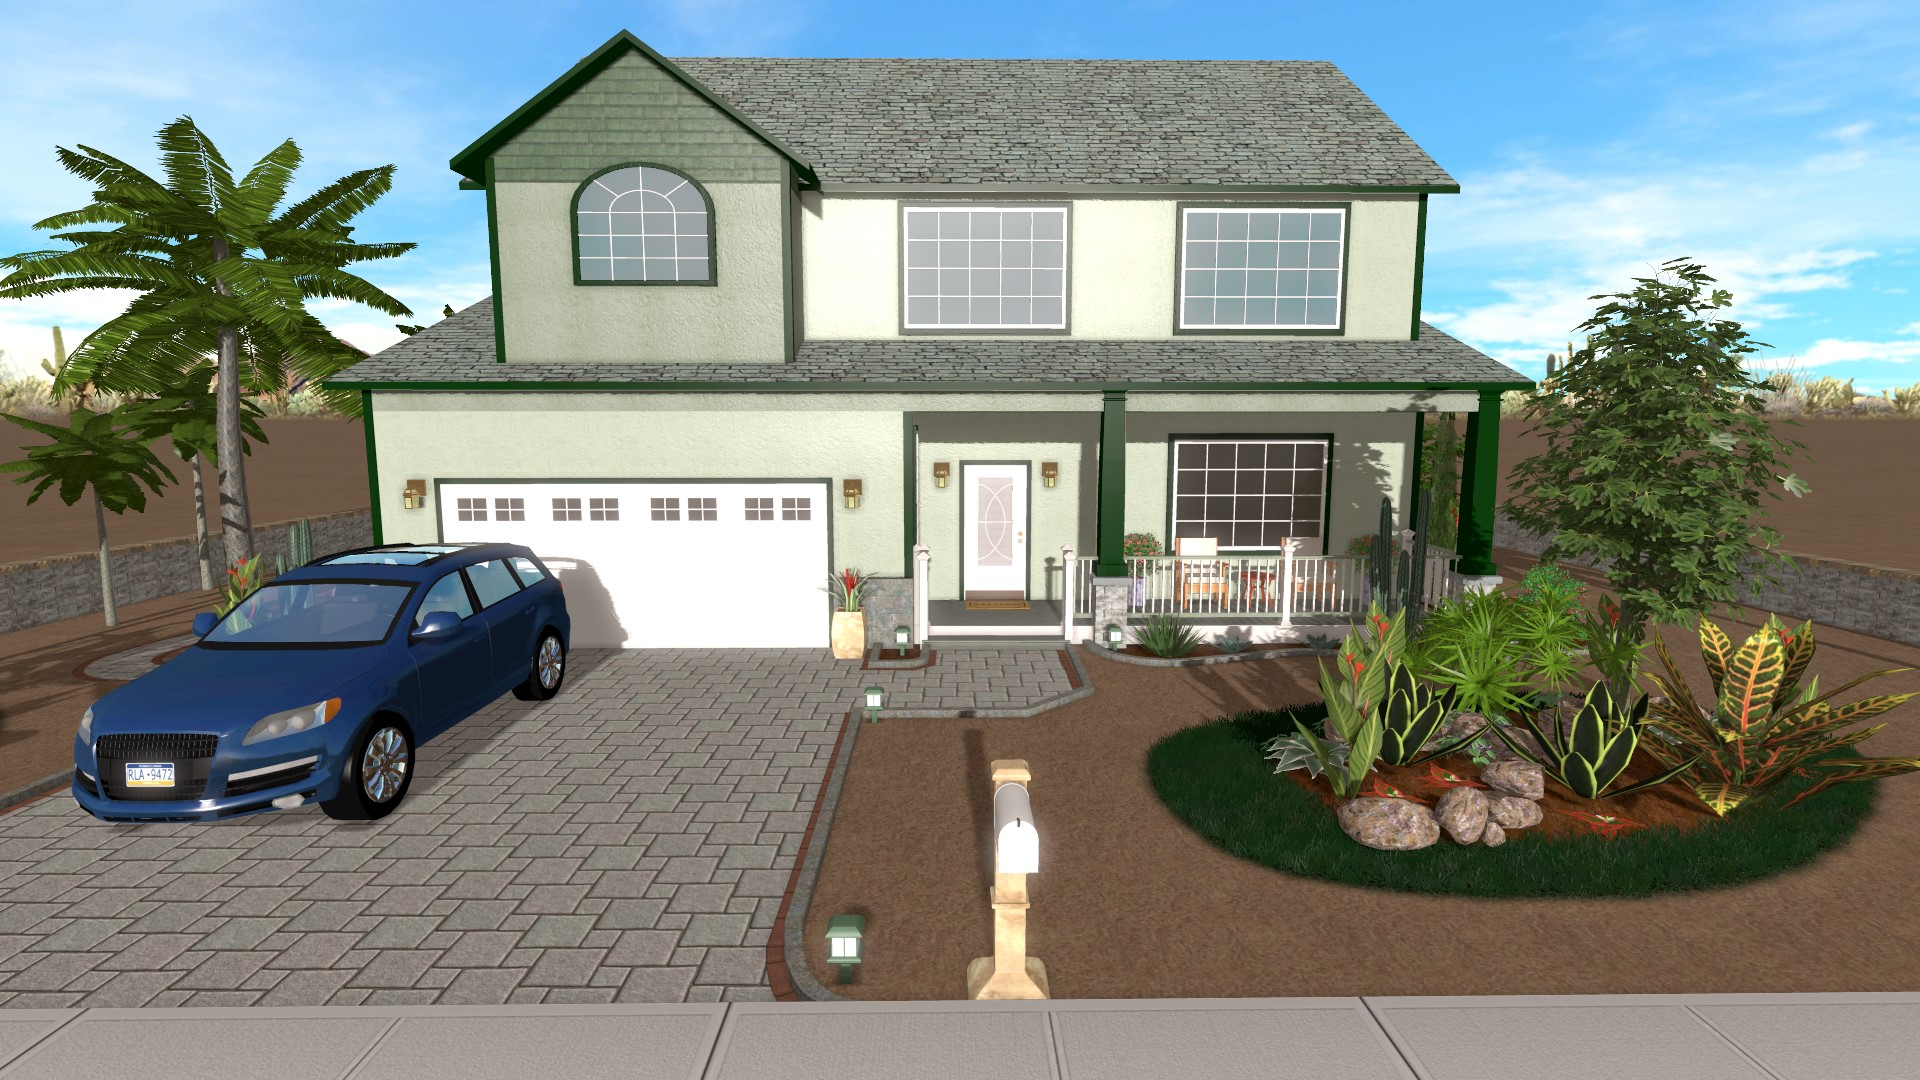 Best Professional Landscape Design Software Turbofloorplan Home ...